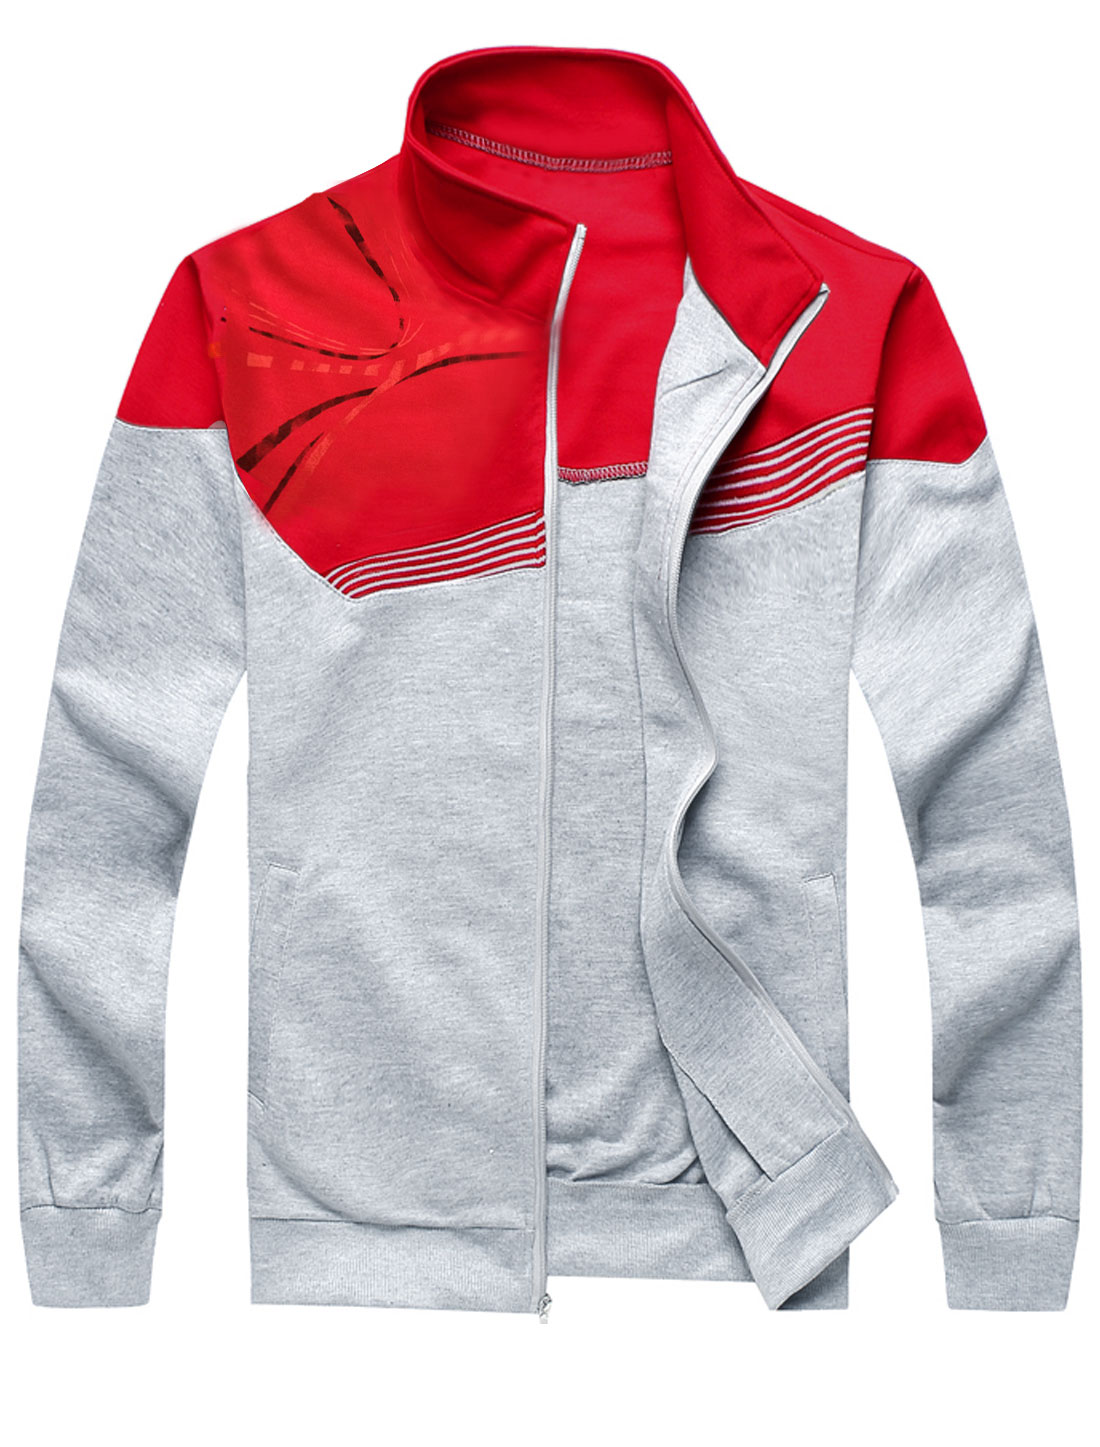 Man Stand Collar Long Sleeve Splicing Sweatshirt w Slant Pockets Elastic Waist Pants Red M